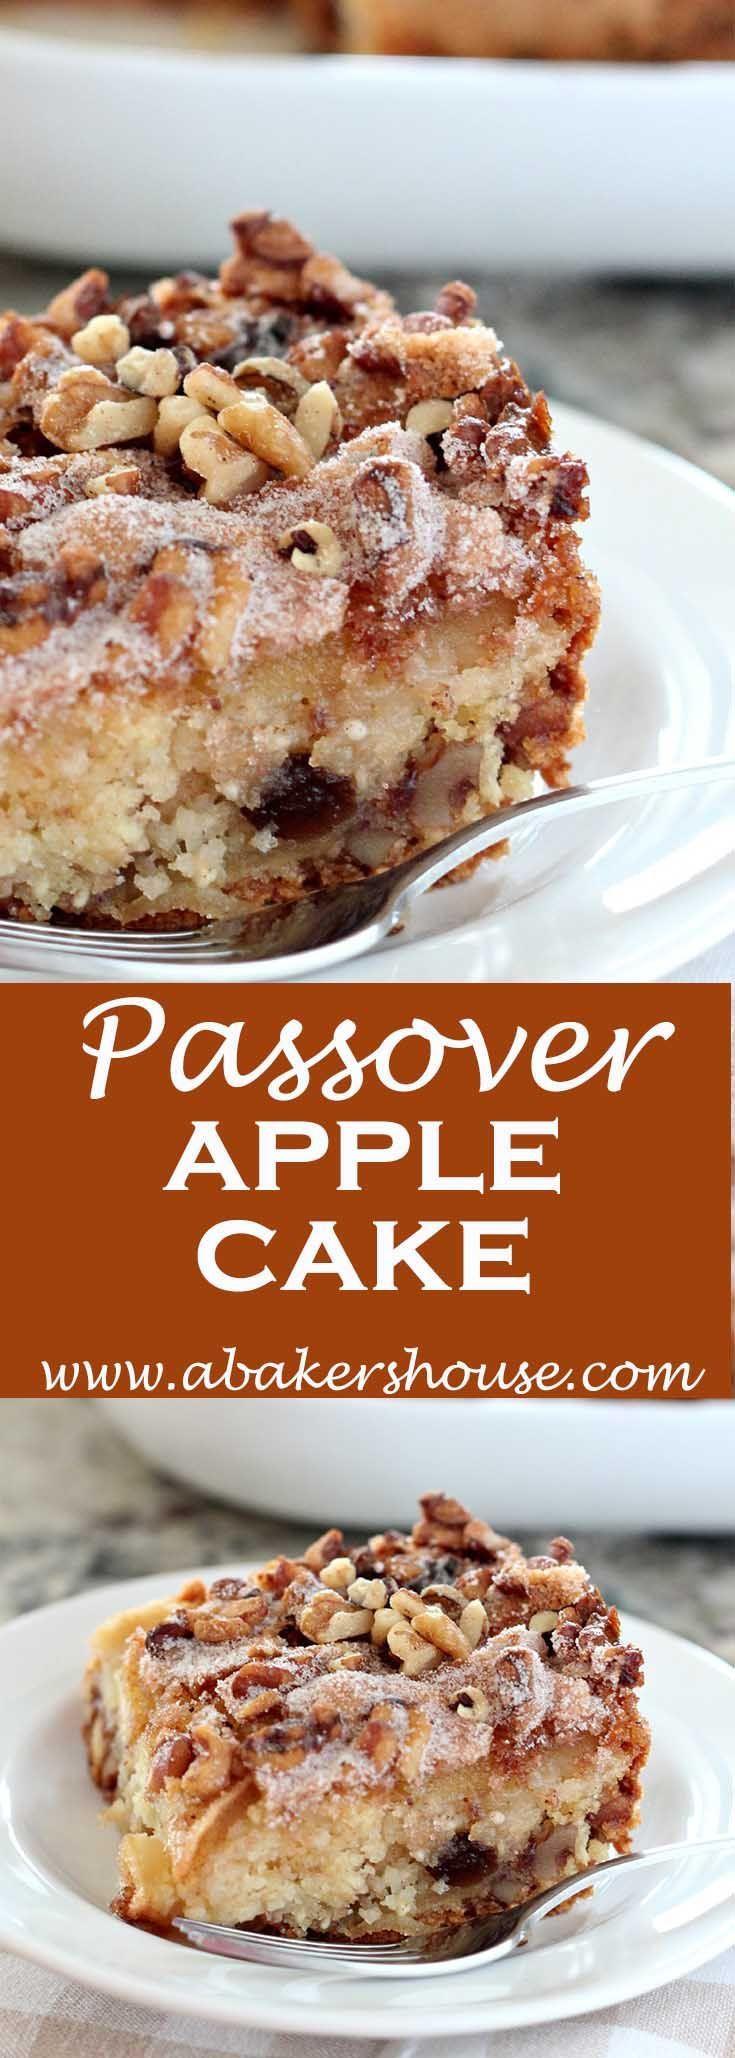 Easy Passover Desserts  Best 25 Passover desserts ideas on Pinterest